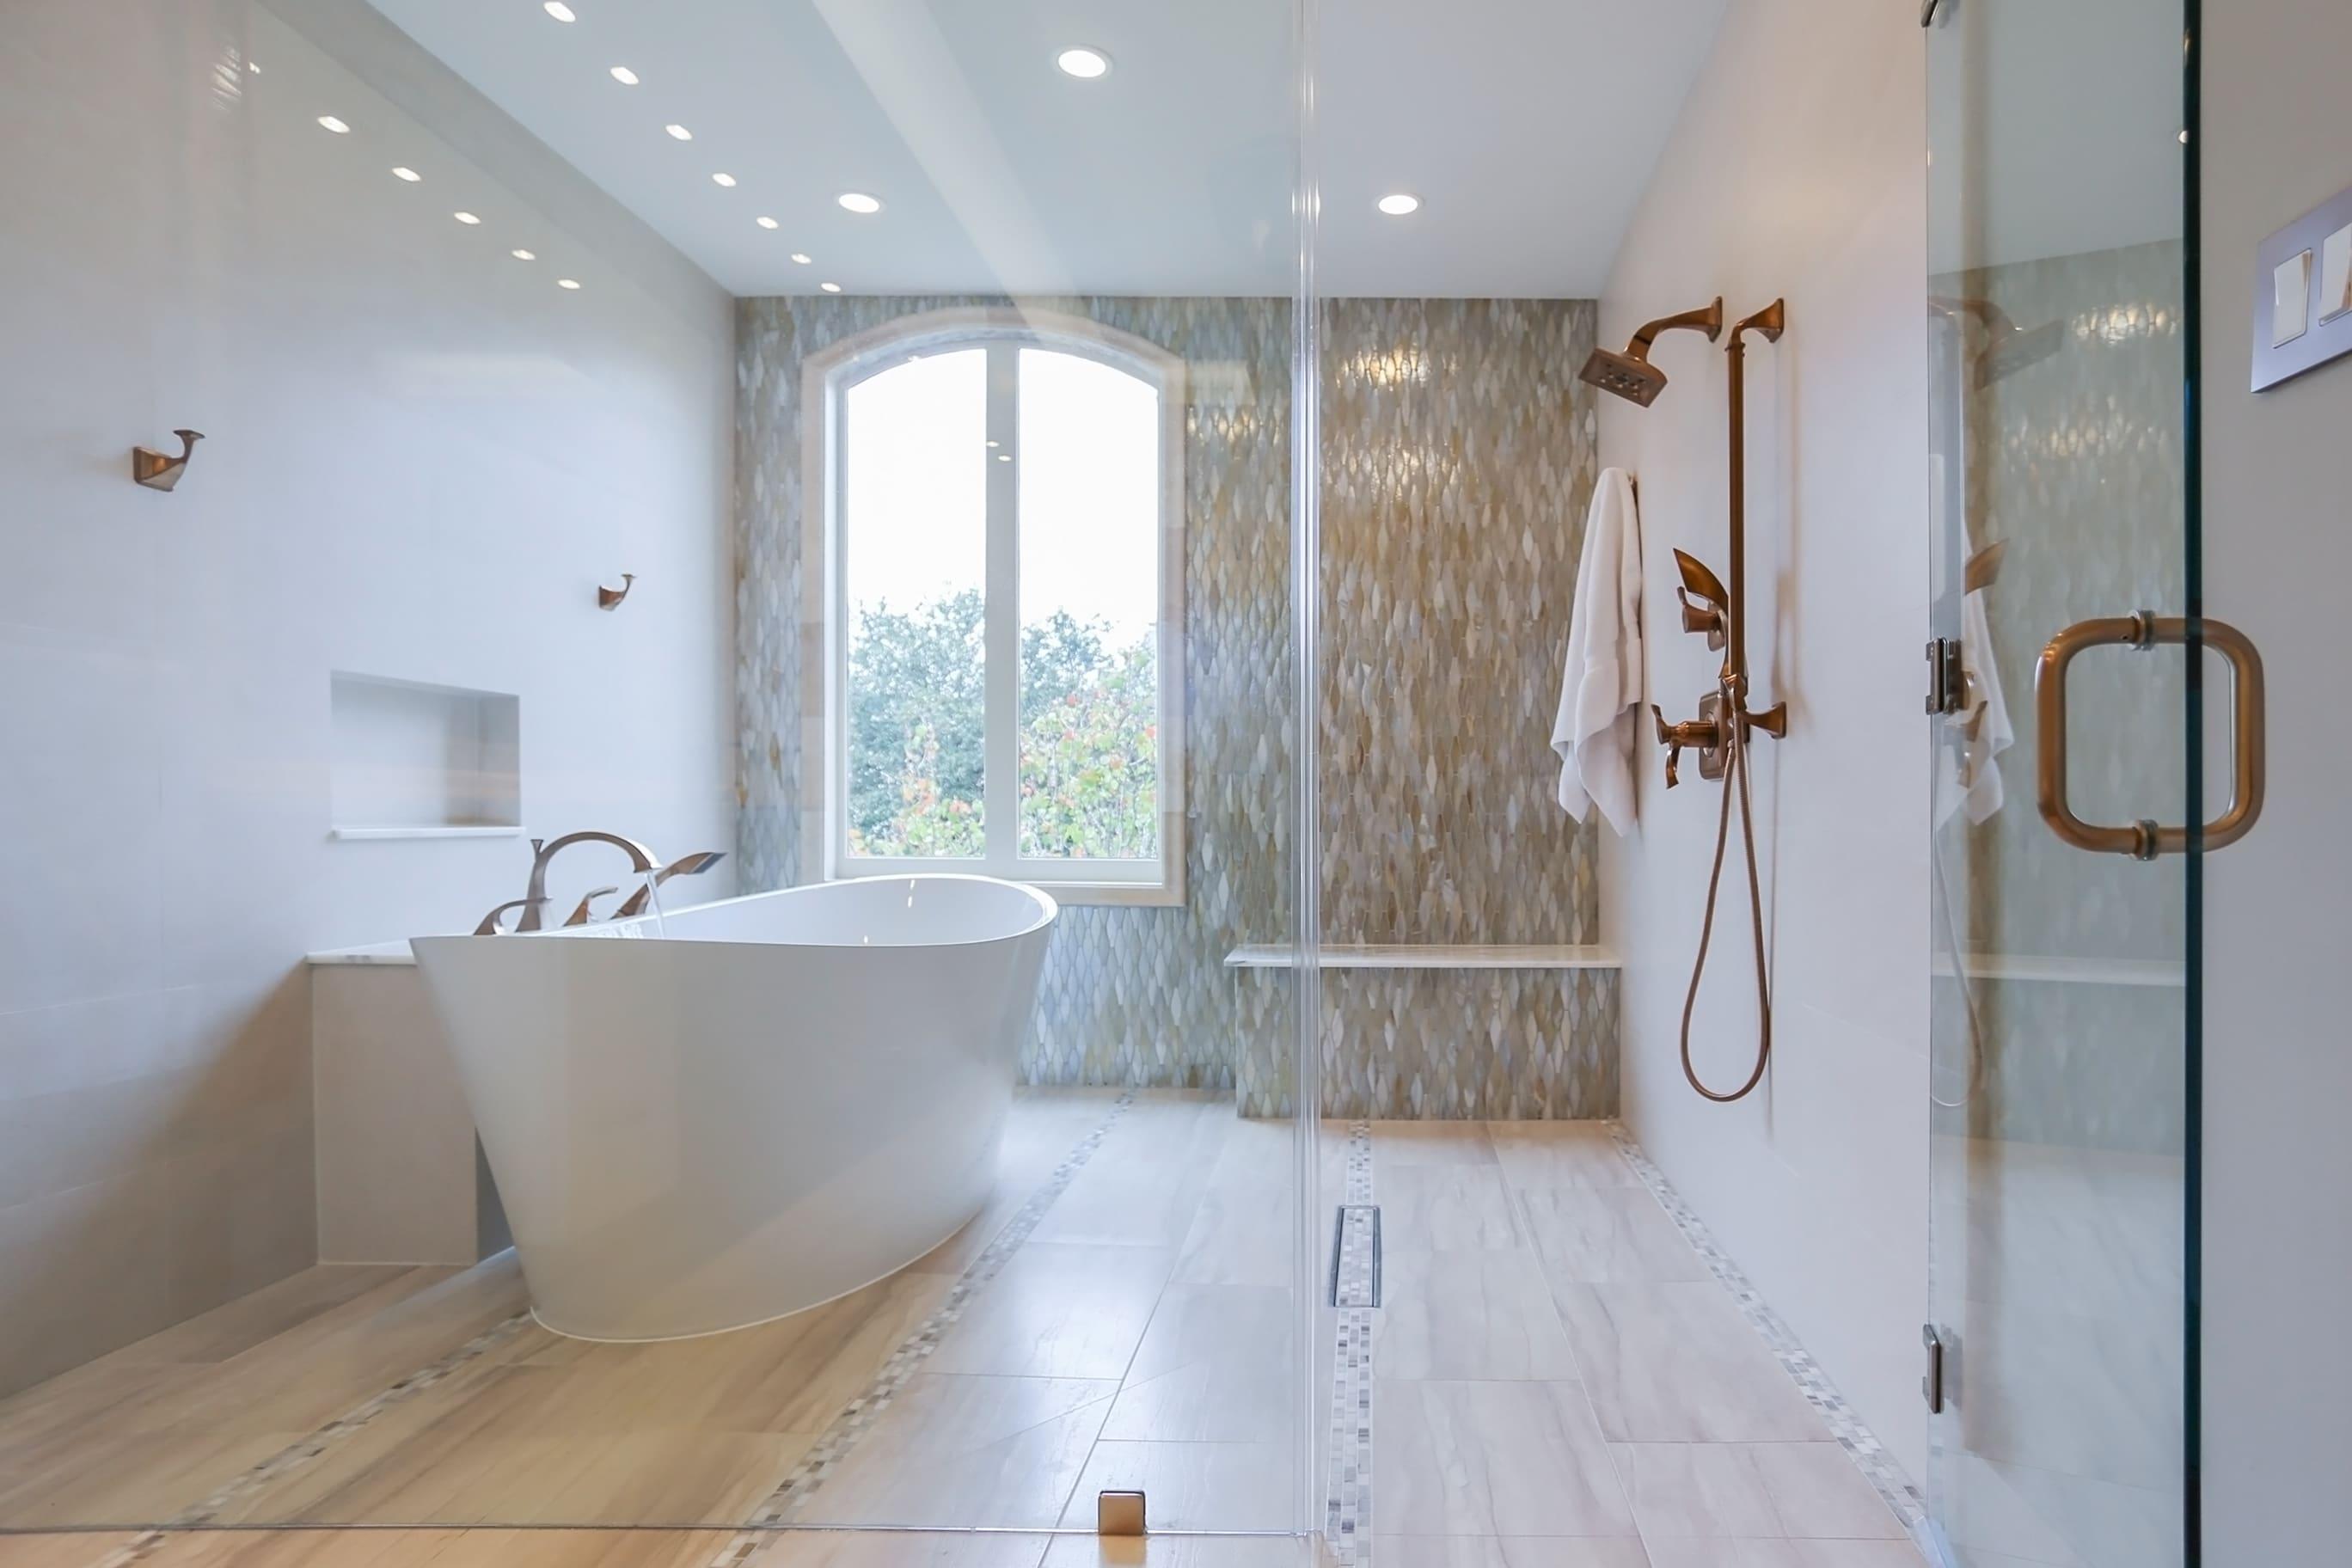 Bathroom Design Houston. River Oaks | Houston, Texas Tranquil Spa Master  Bathroom Remodel Design